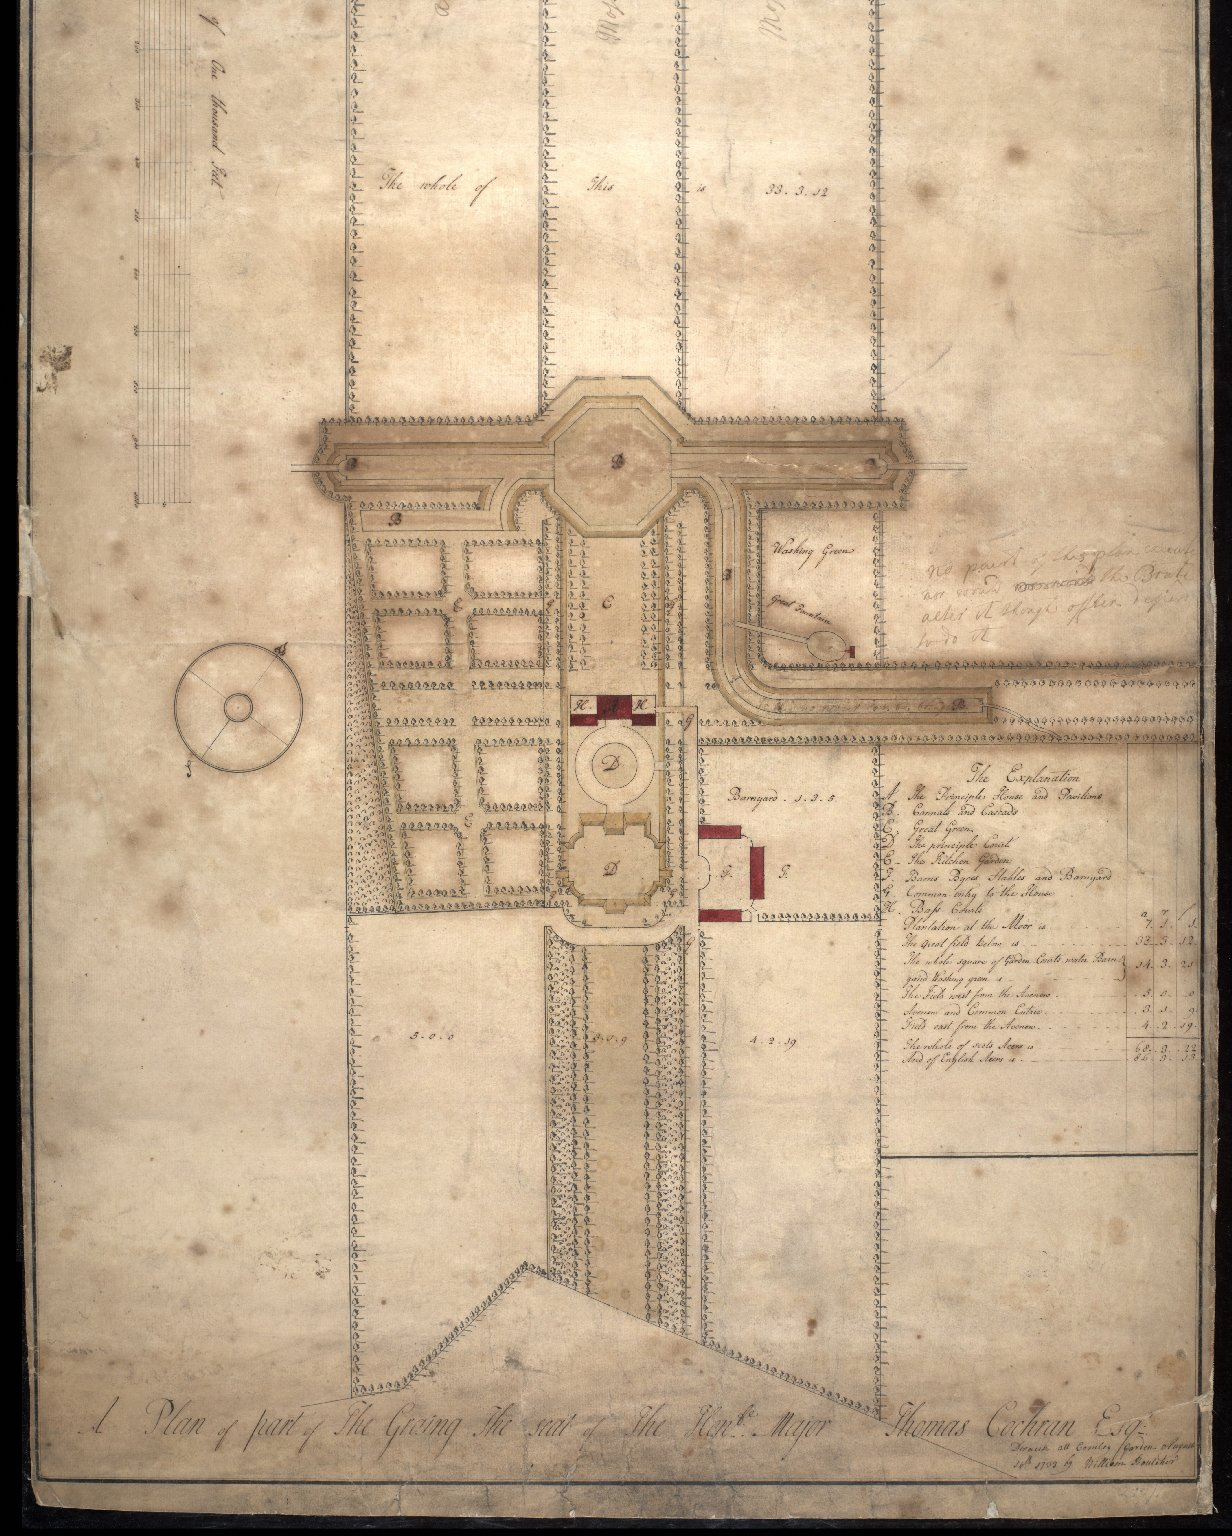 Plan of part of The Graing [i.e. Grange], the seat of the Hon. Major Thomas Cockran Esq. [2 of 2]